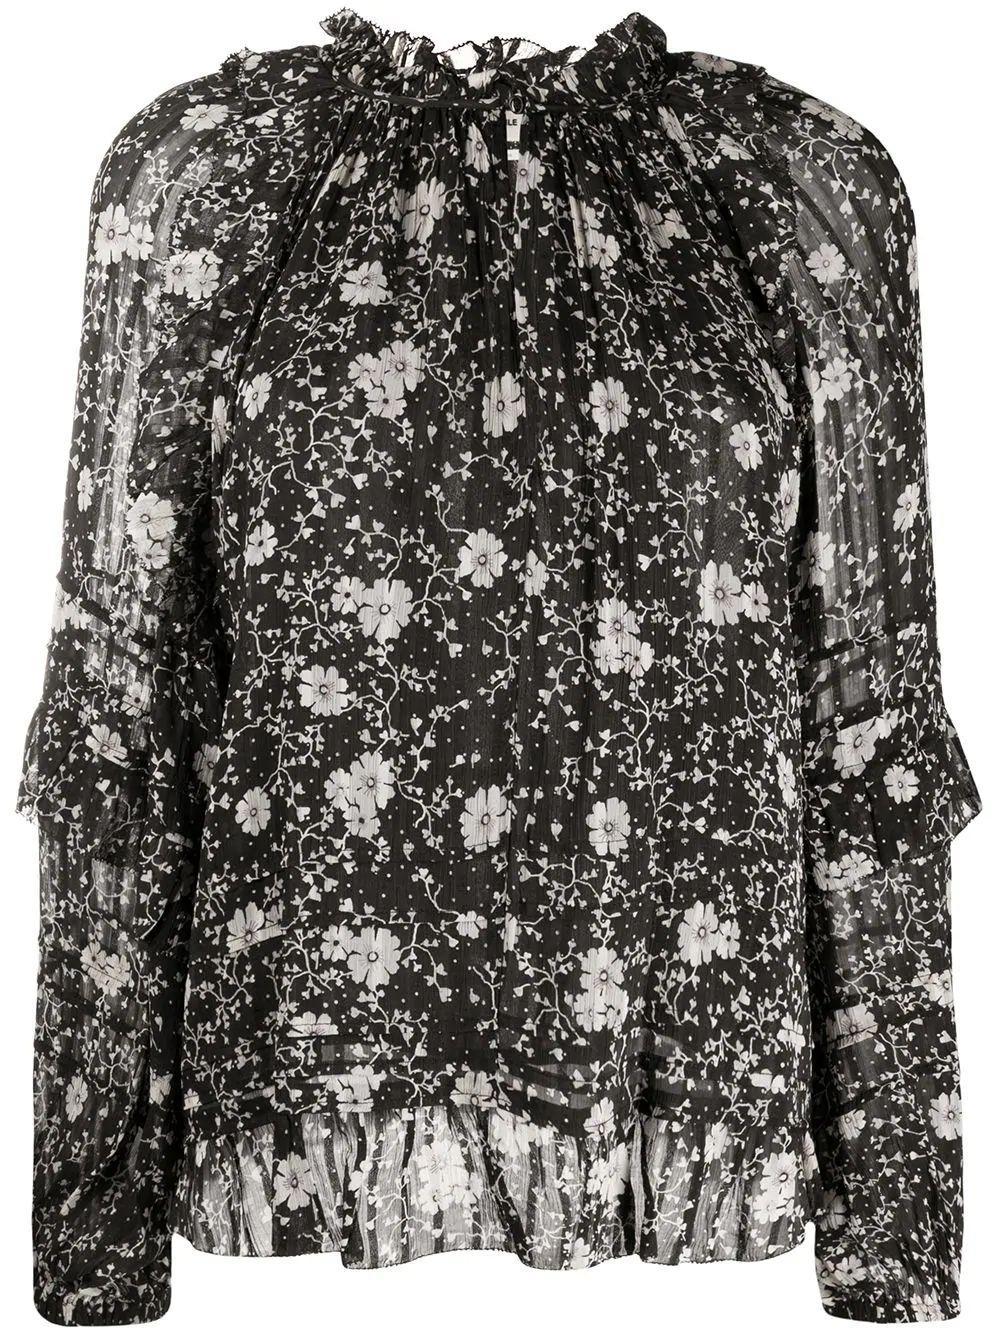 L/S Floral Print Blouse Item # EYDEN